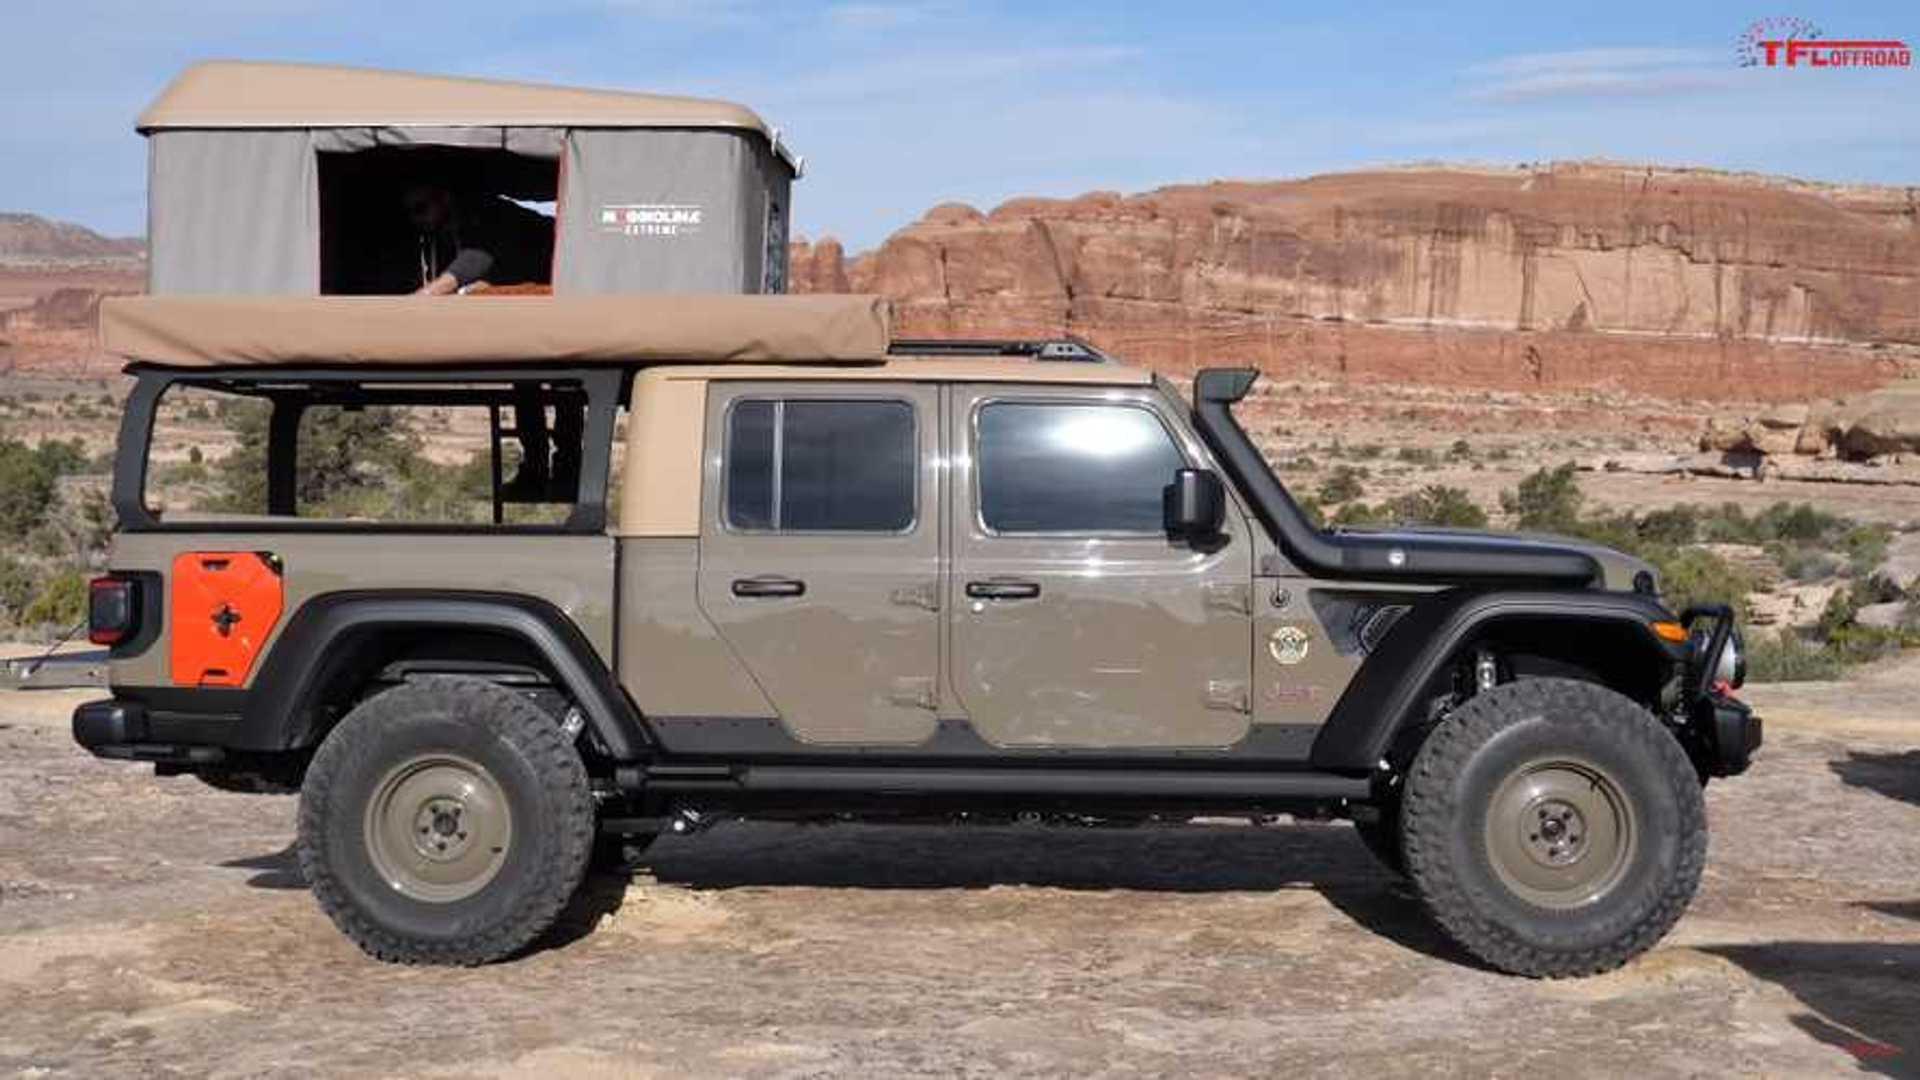 Jeep Gladiator Wayout Concept Overlander Detailed On Video